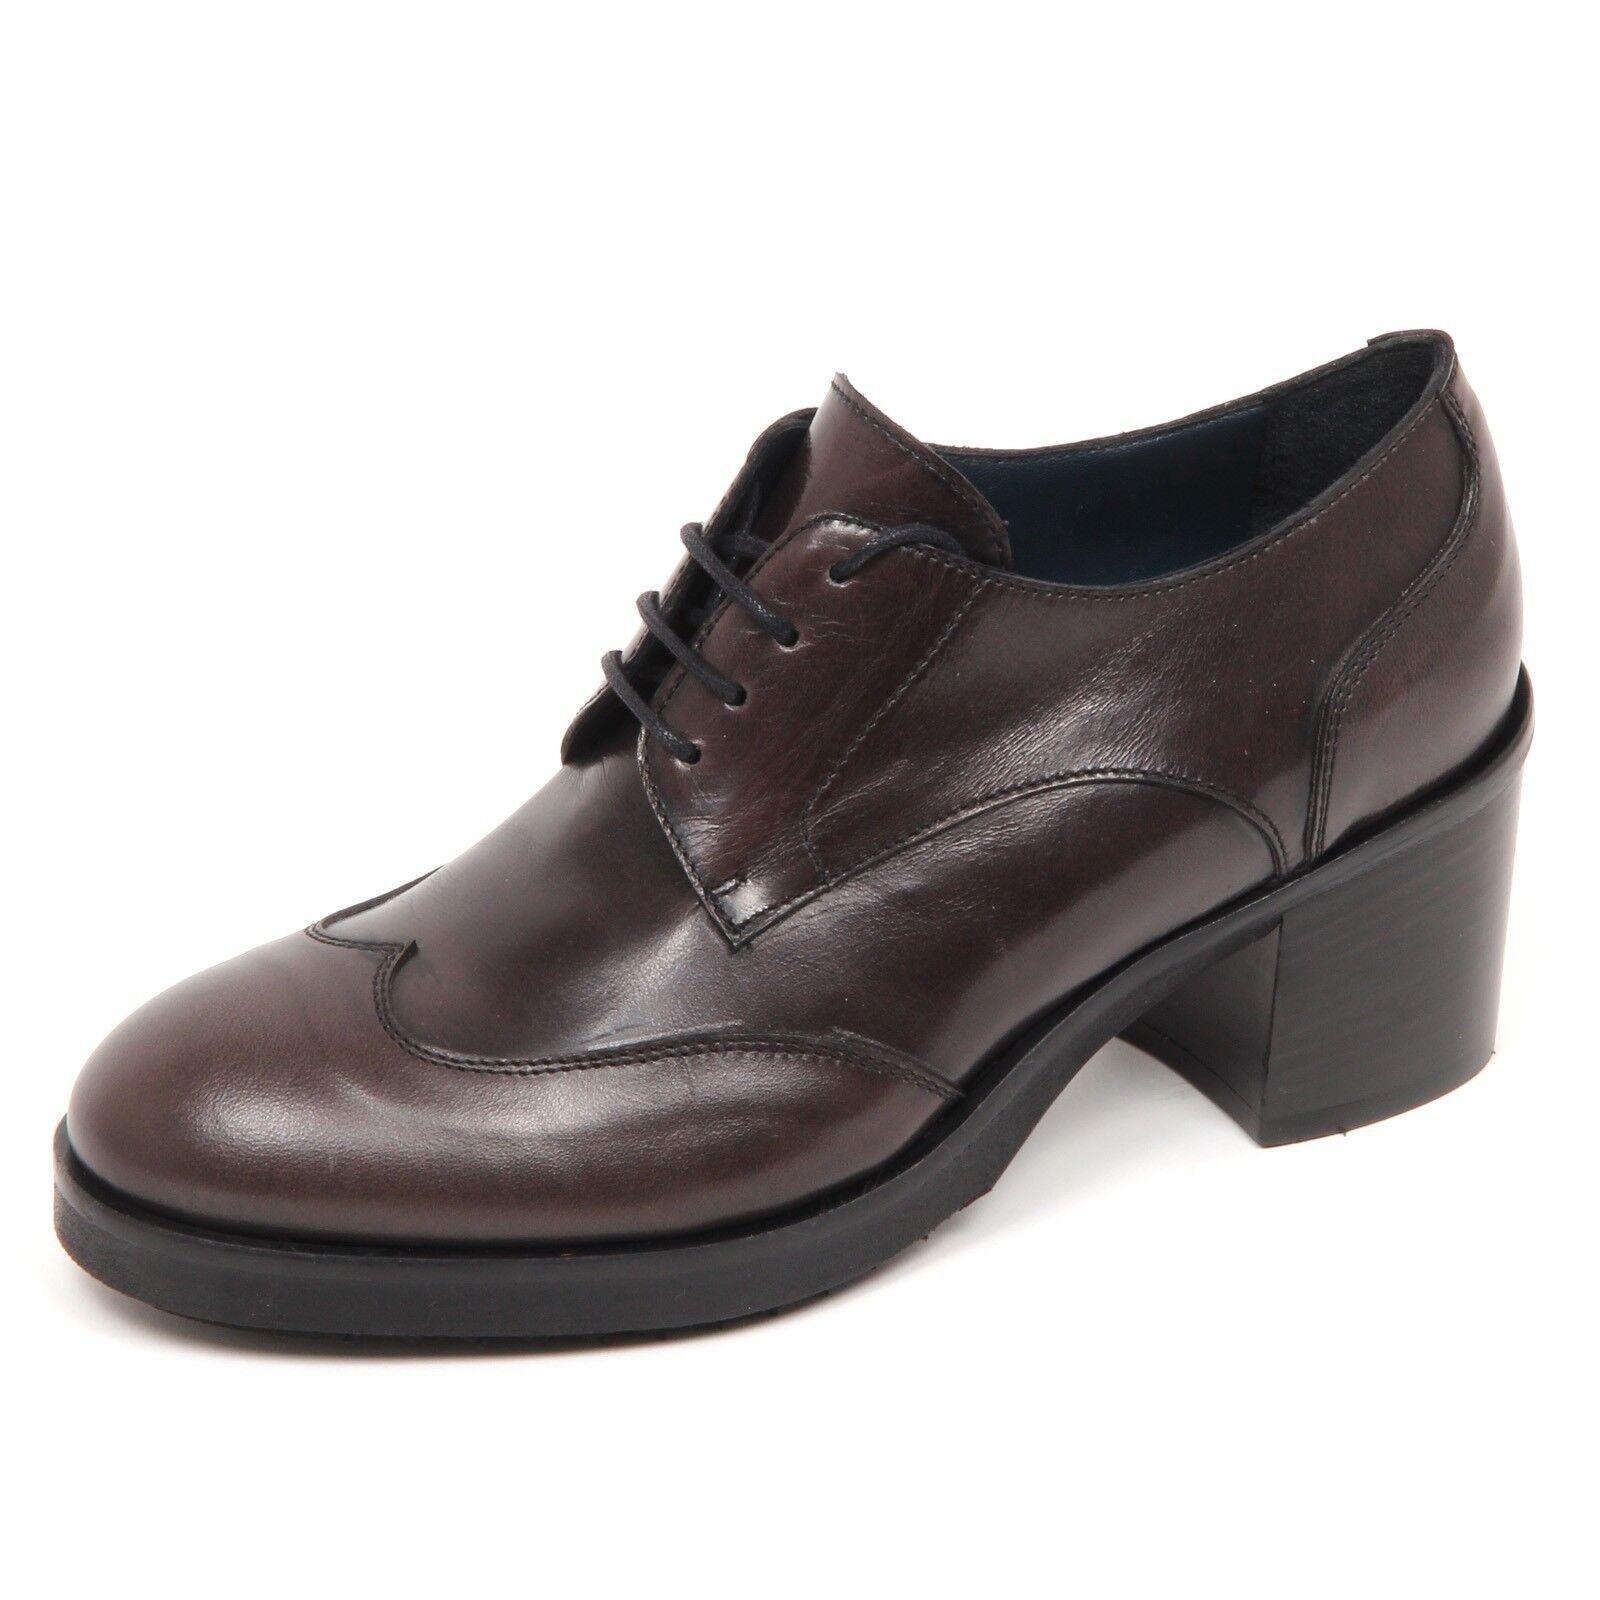 Grandes zapatos con descuento E1164 scarpa donna brush grey LE BLE vintage shoe boot woman